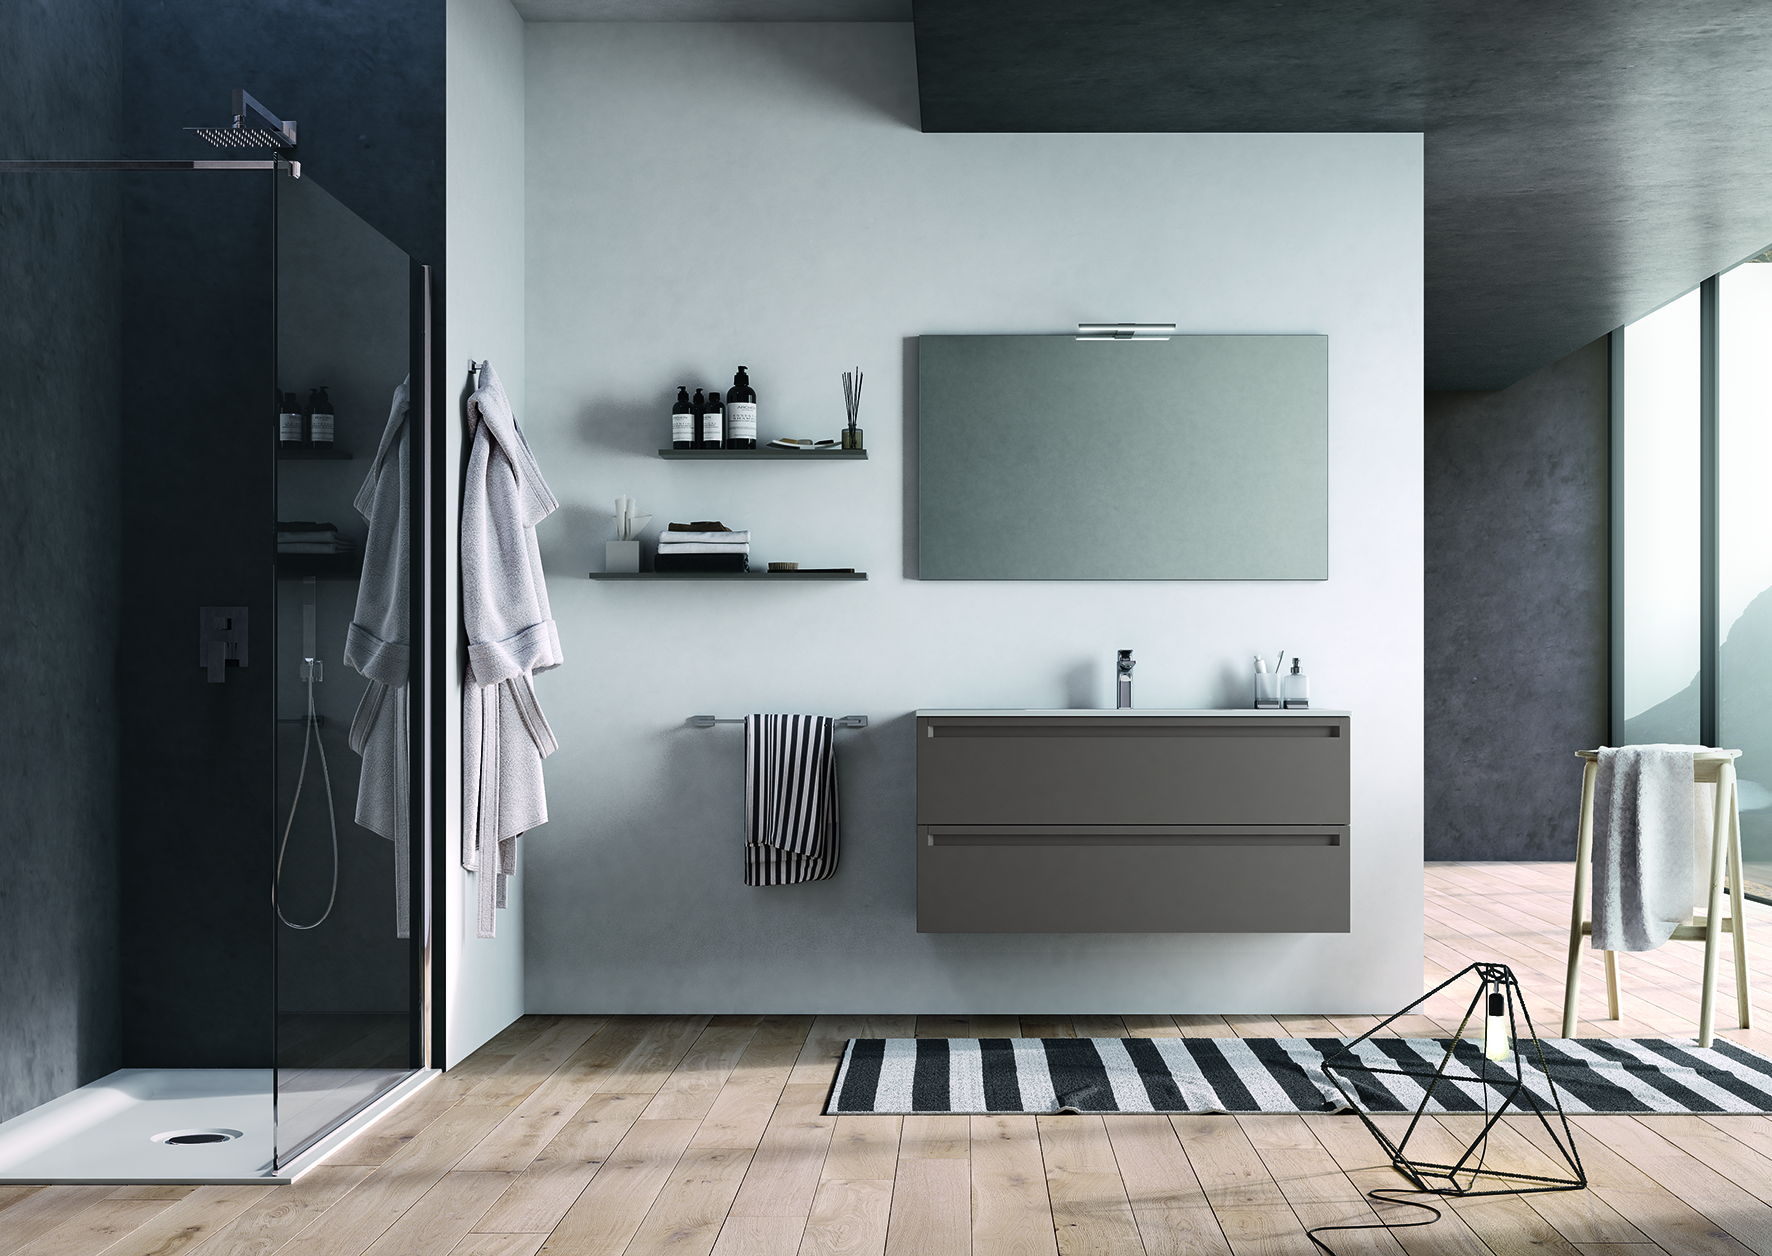 Radiateur Salle De Bain Facq ~ inda salle de bain awesome inda salle de bain with inda salle de